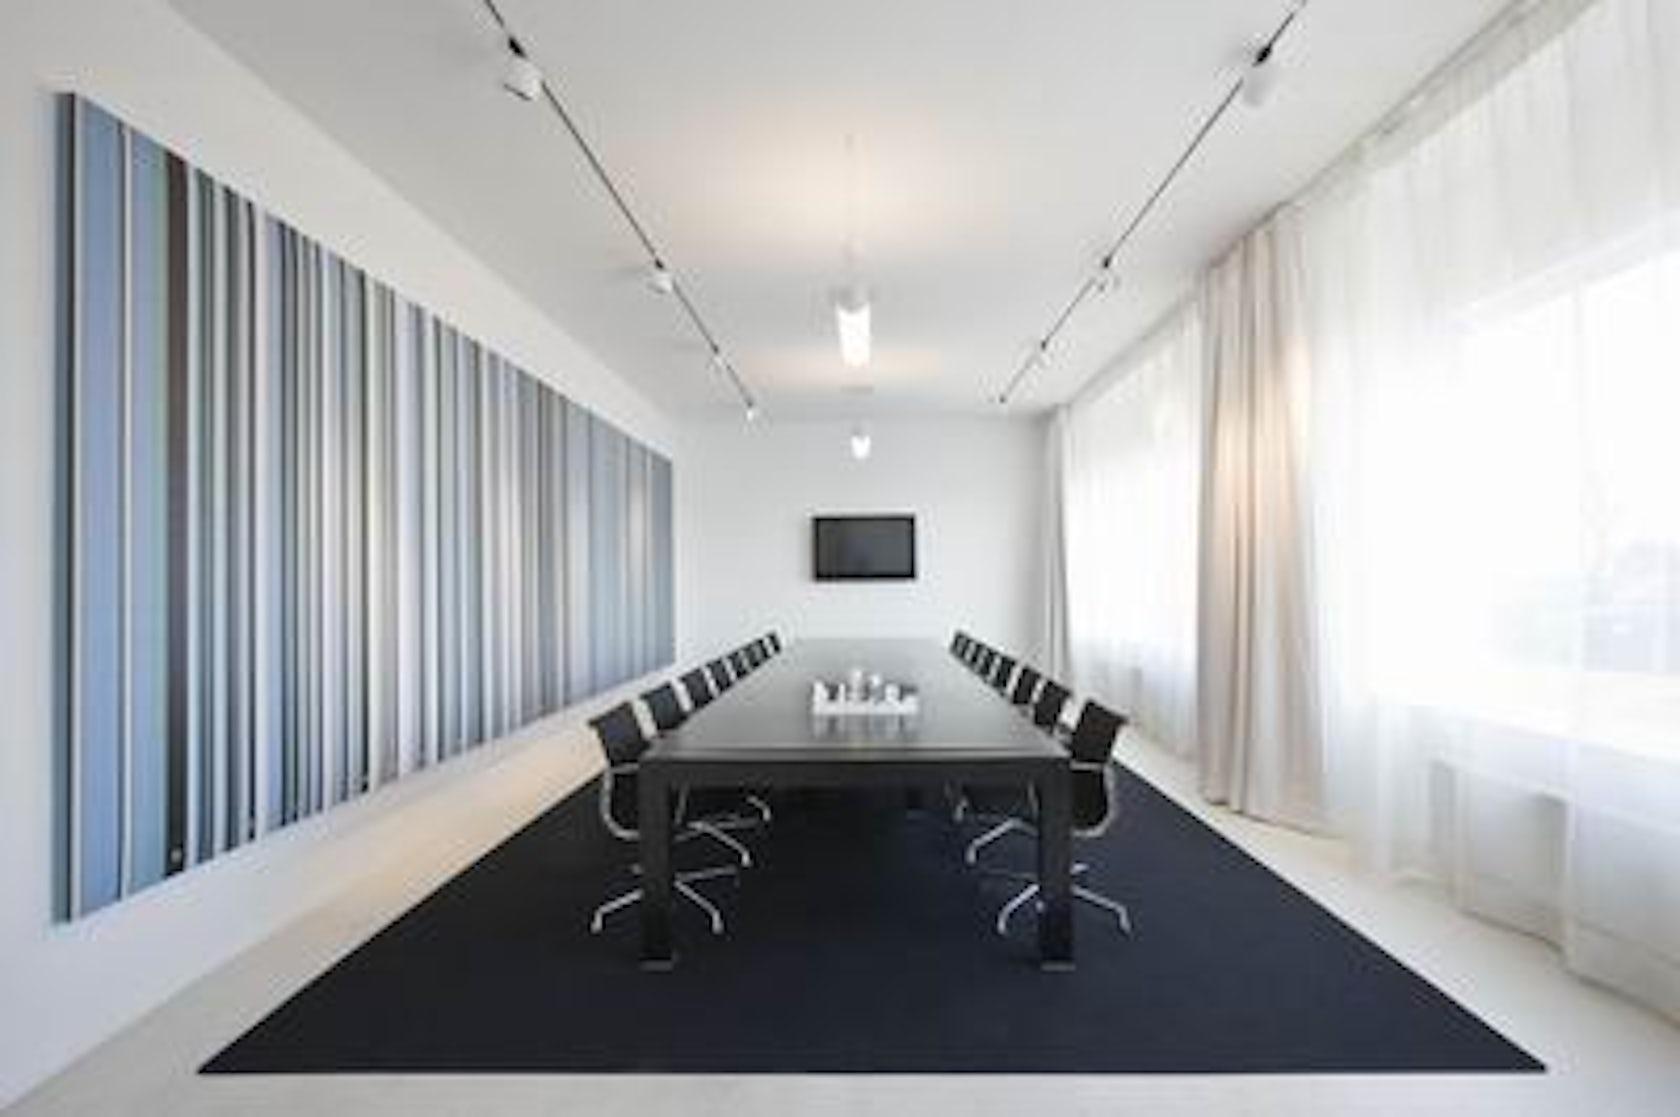 Interior design architectural agency architizer for Interior design agency new york